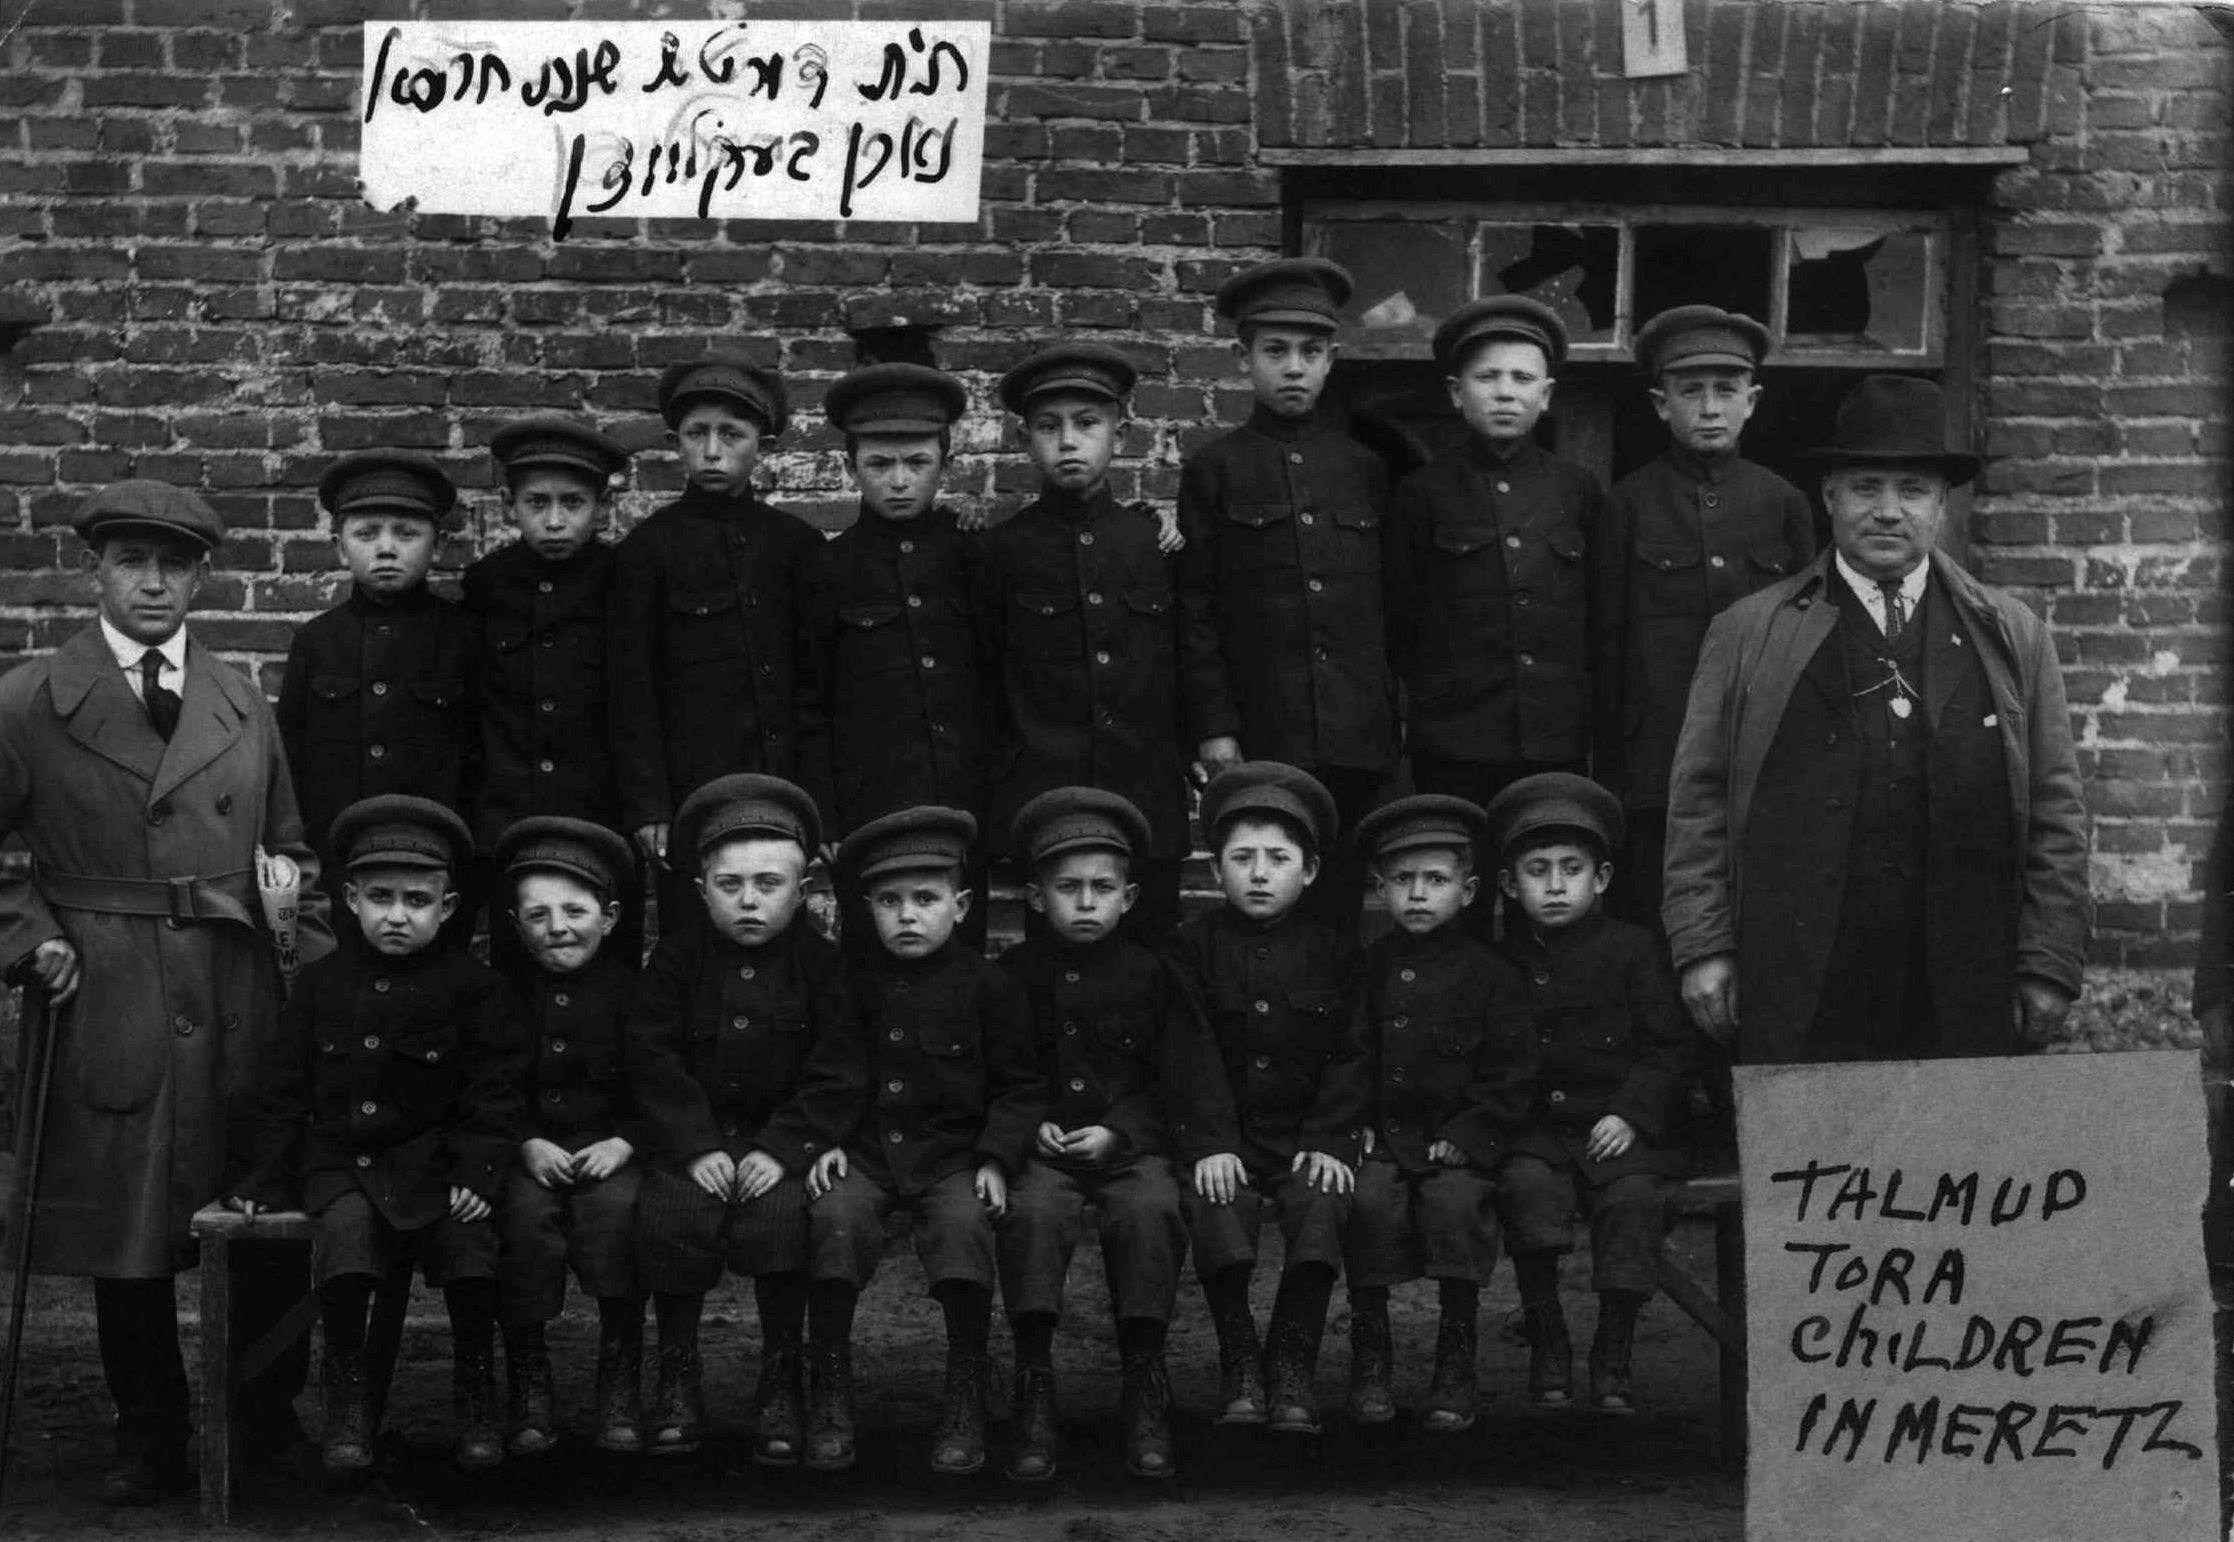 Talmud Torah Children, 1921. We remember, Jewish people